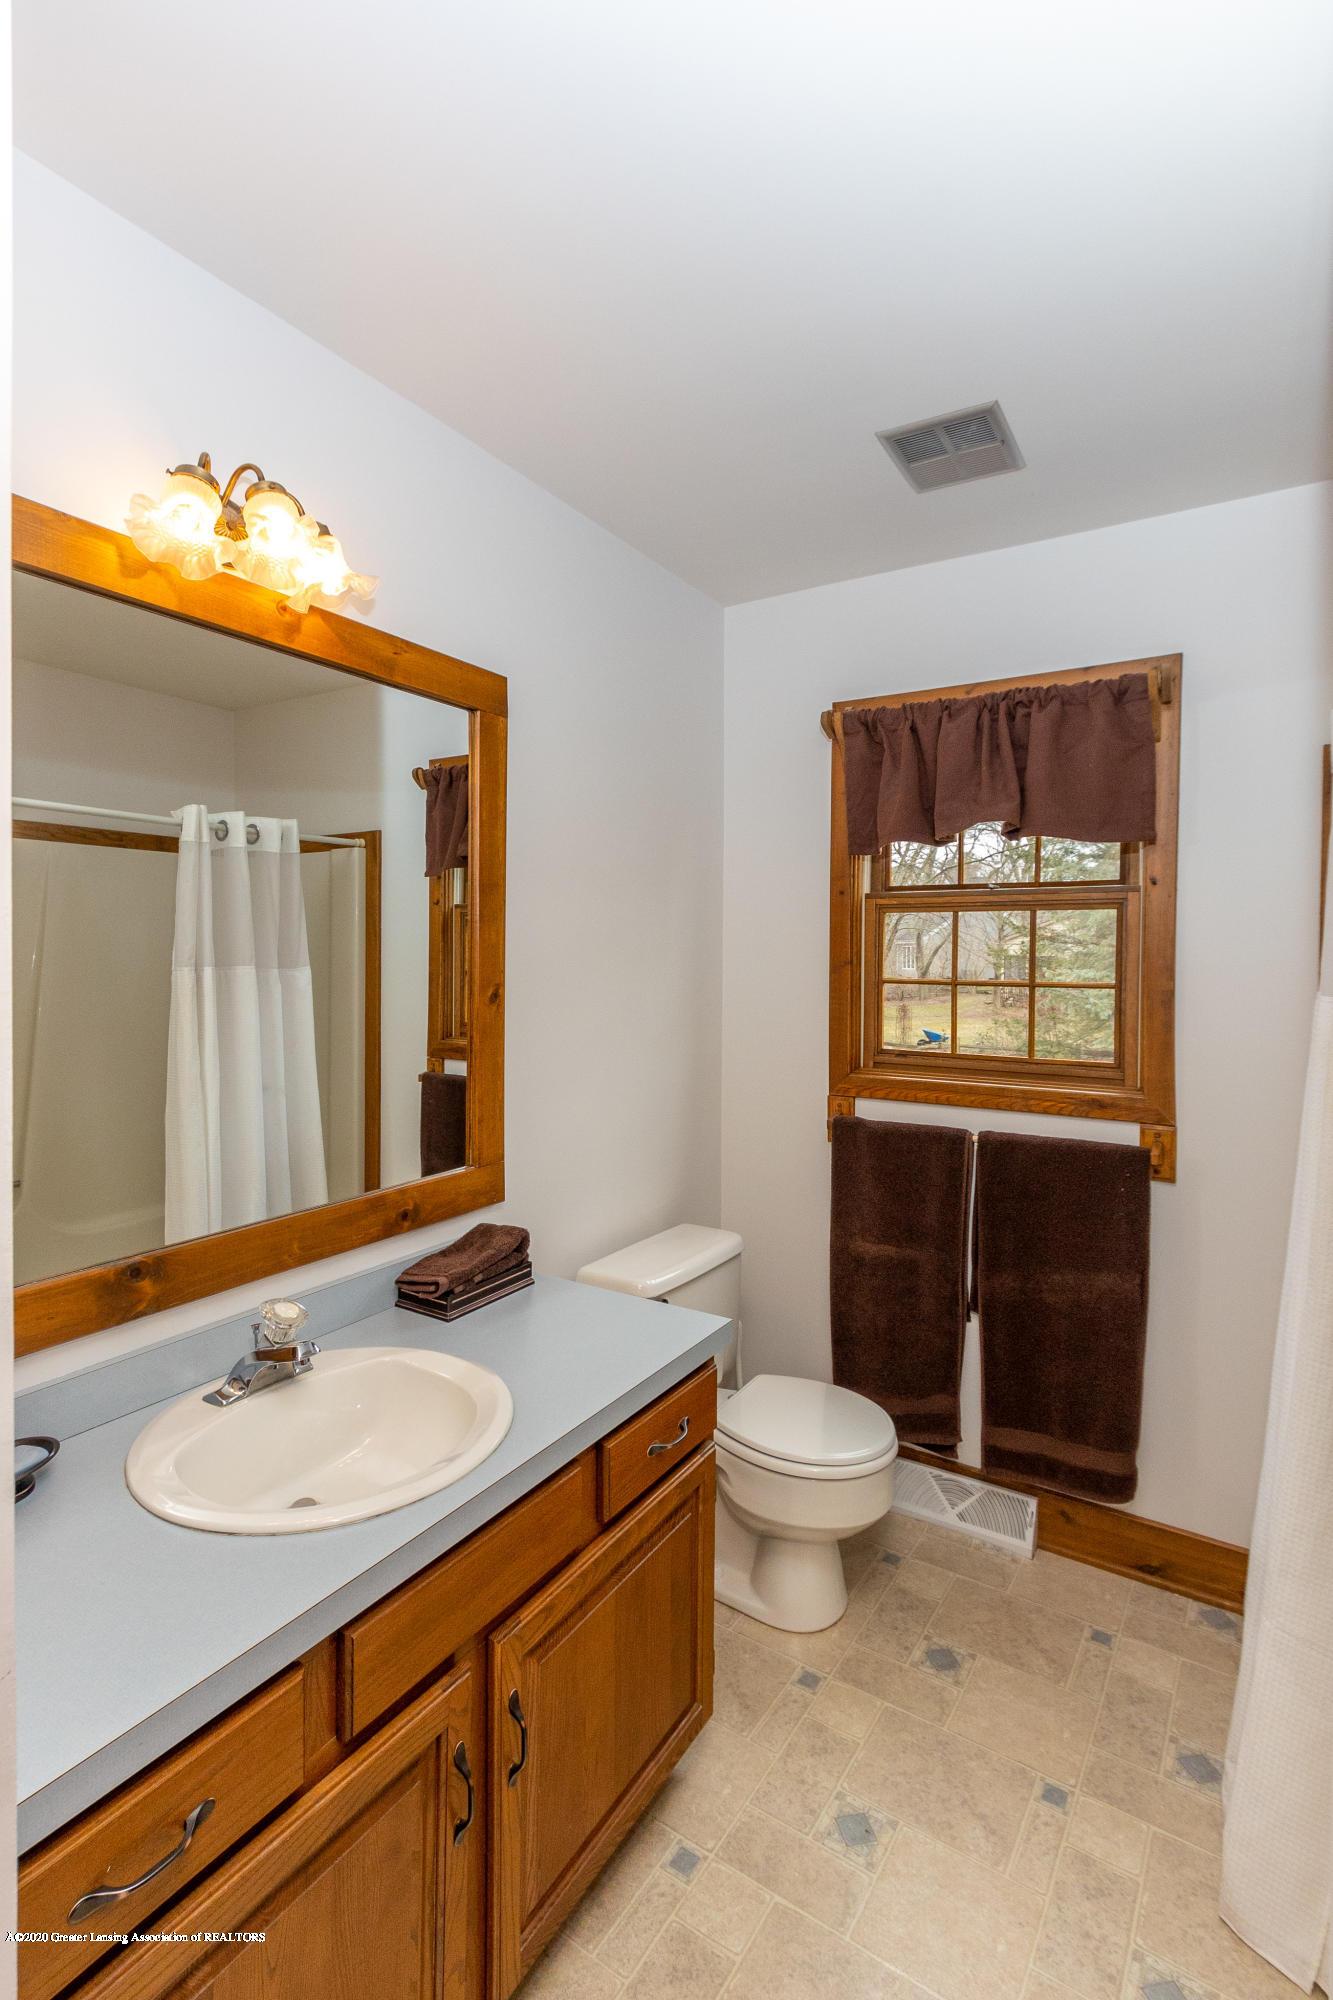 3945 Breckinridge Dr - First Floor Full Bathroom - 25